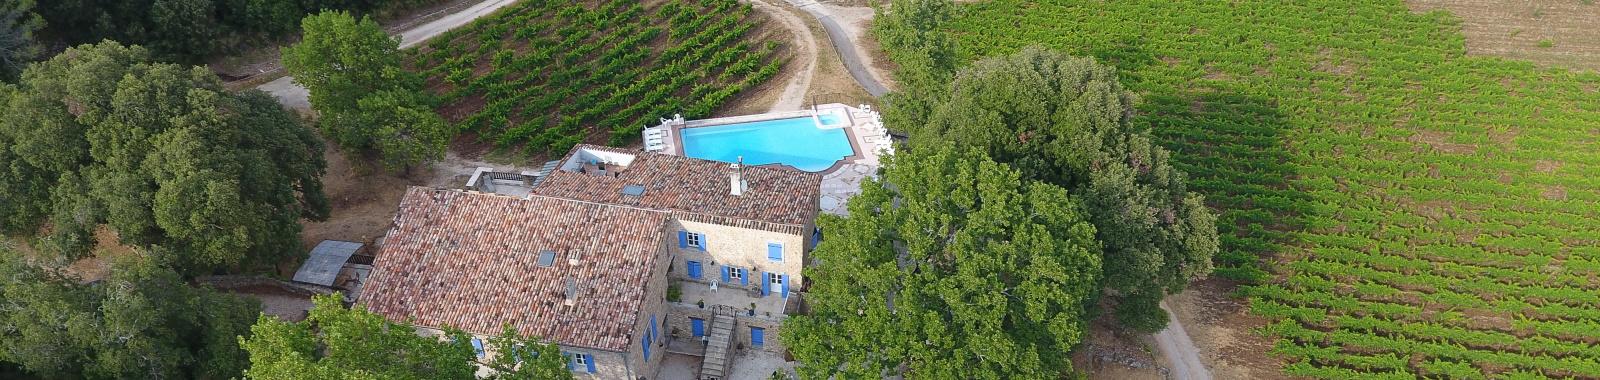 sejour-domaine-chateau-mediterrannee